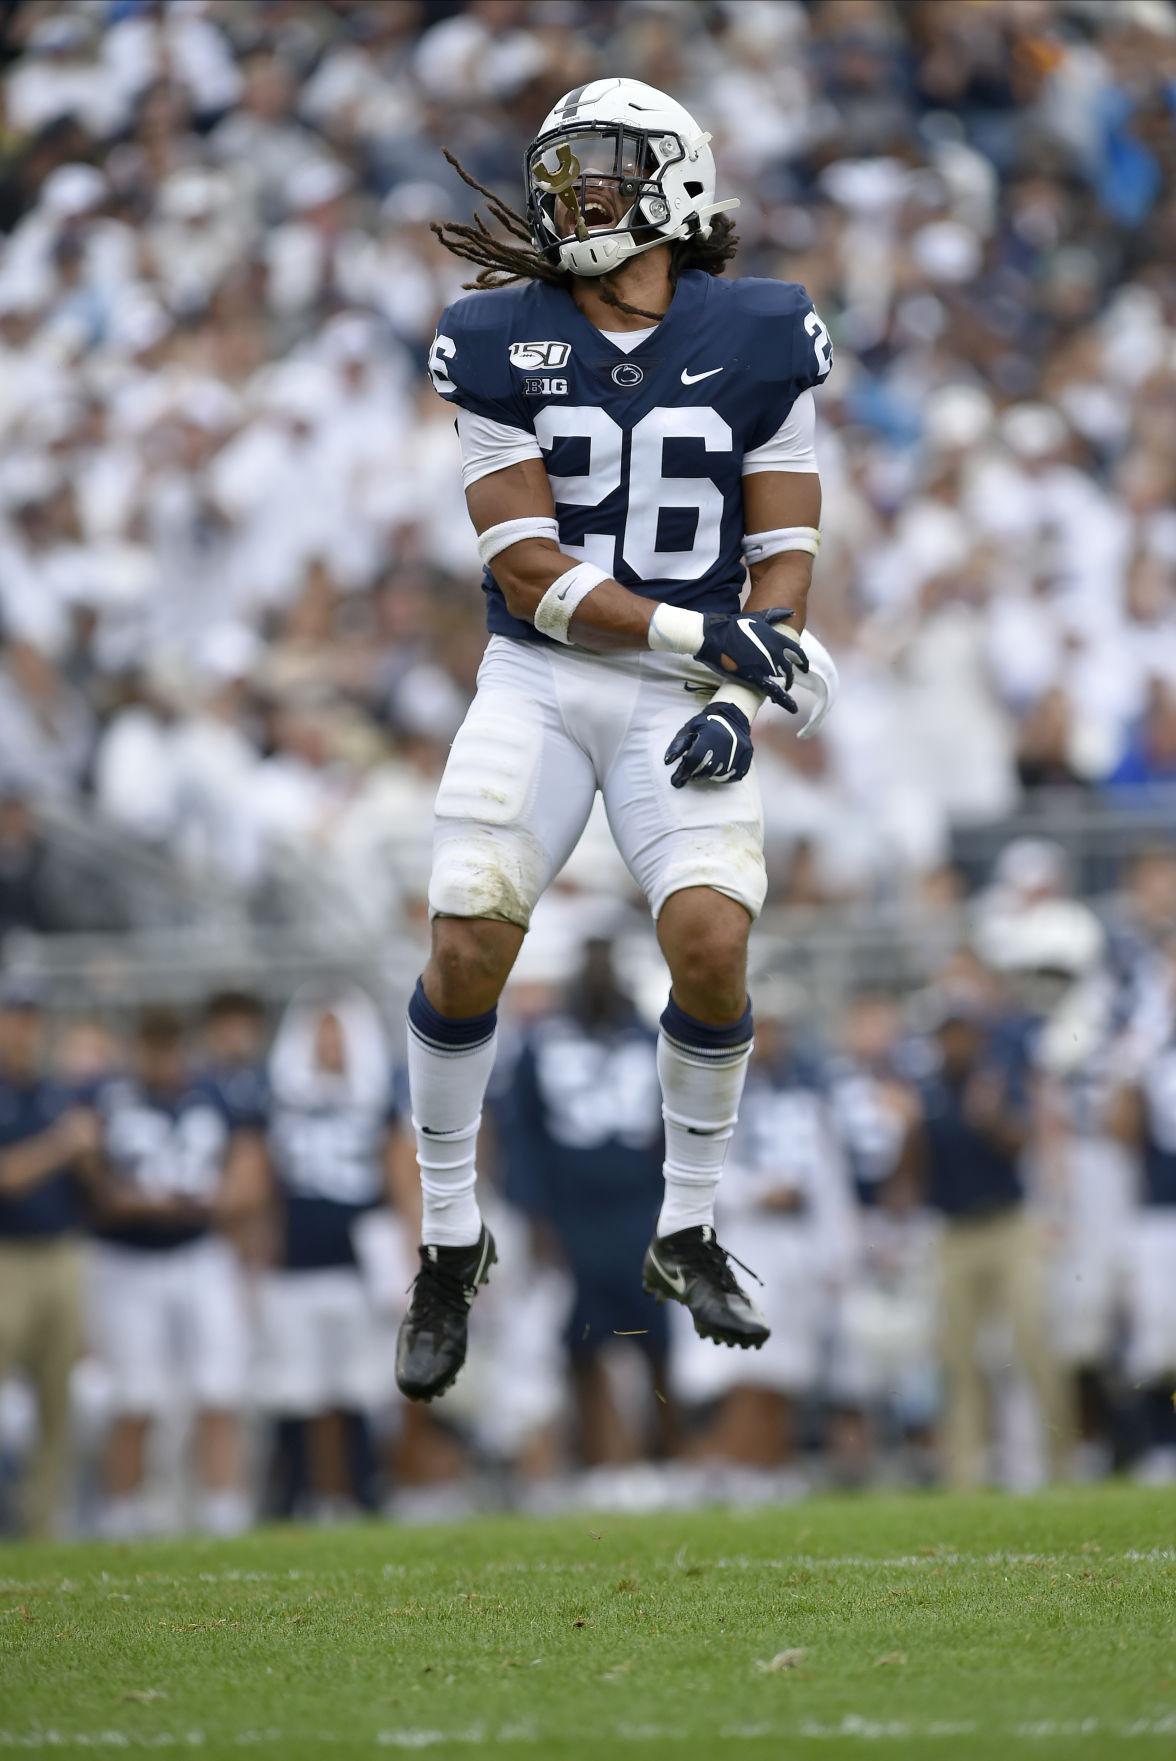 Penn State dreadlocks firestorm